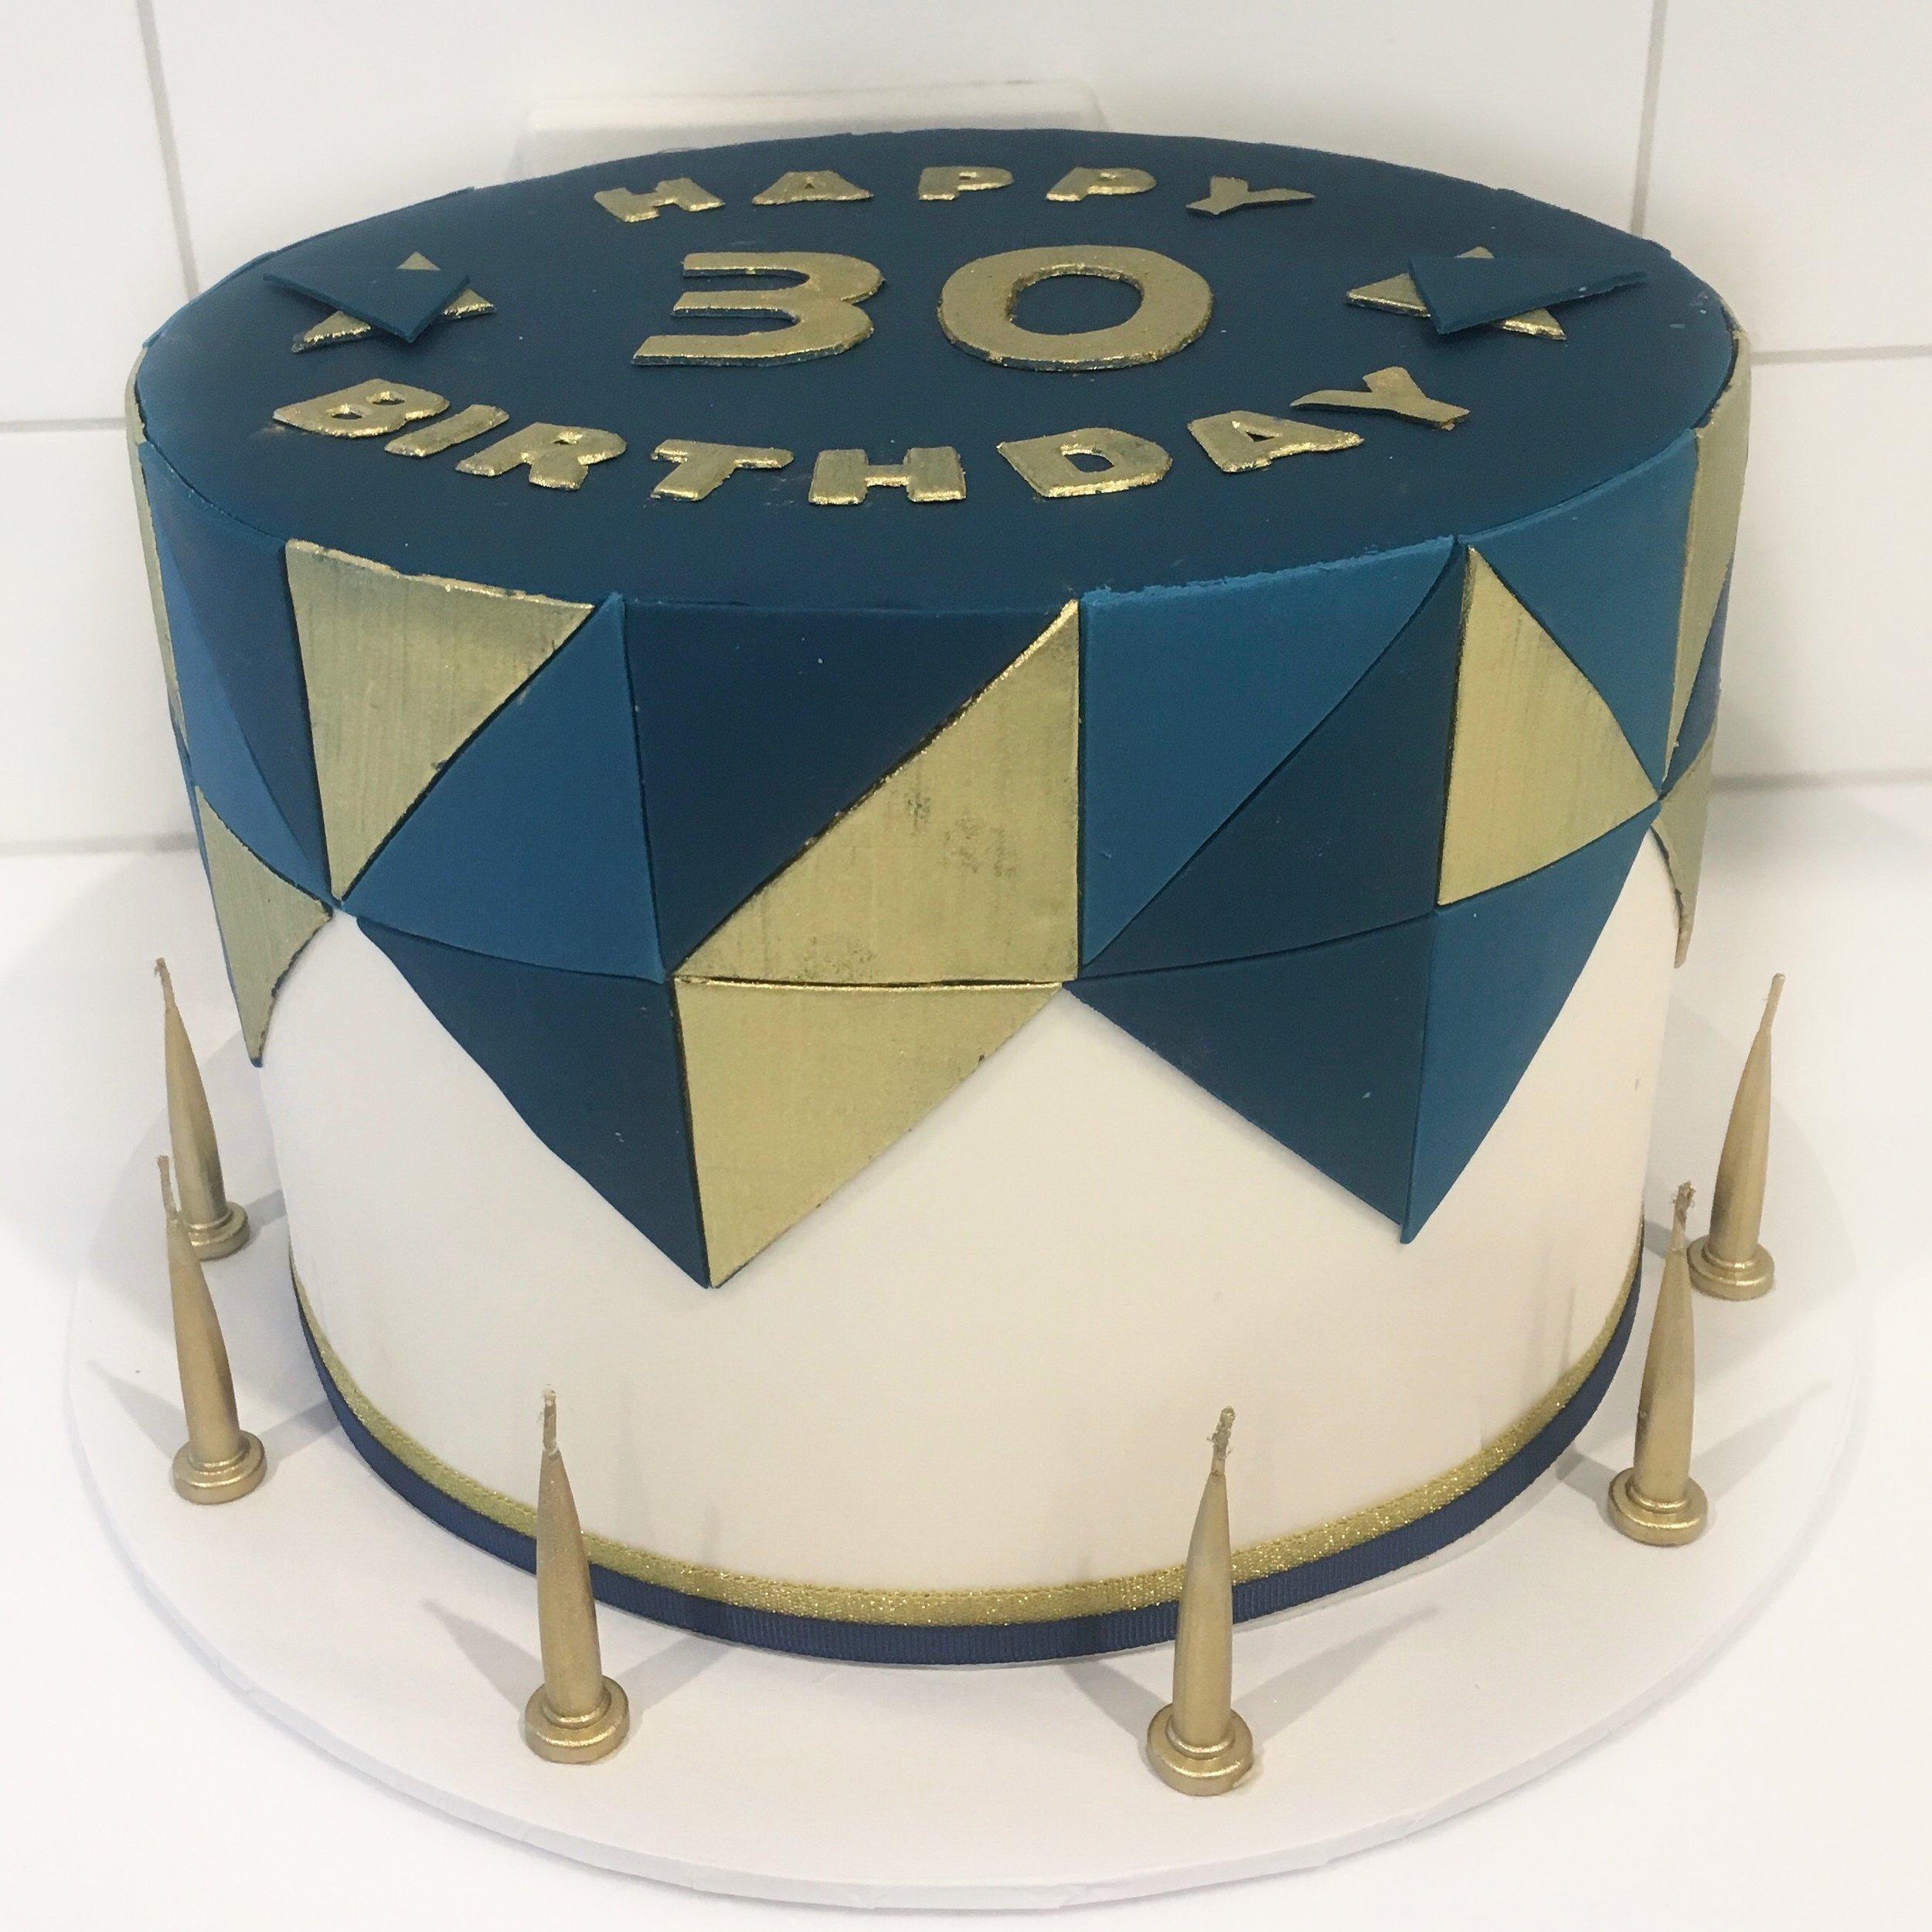 Geometric 30th Birthday Cake